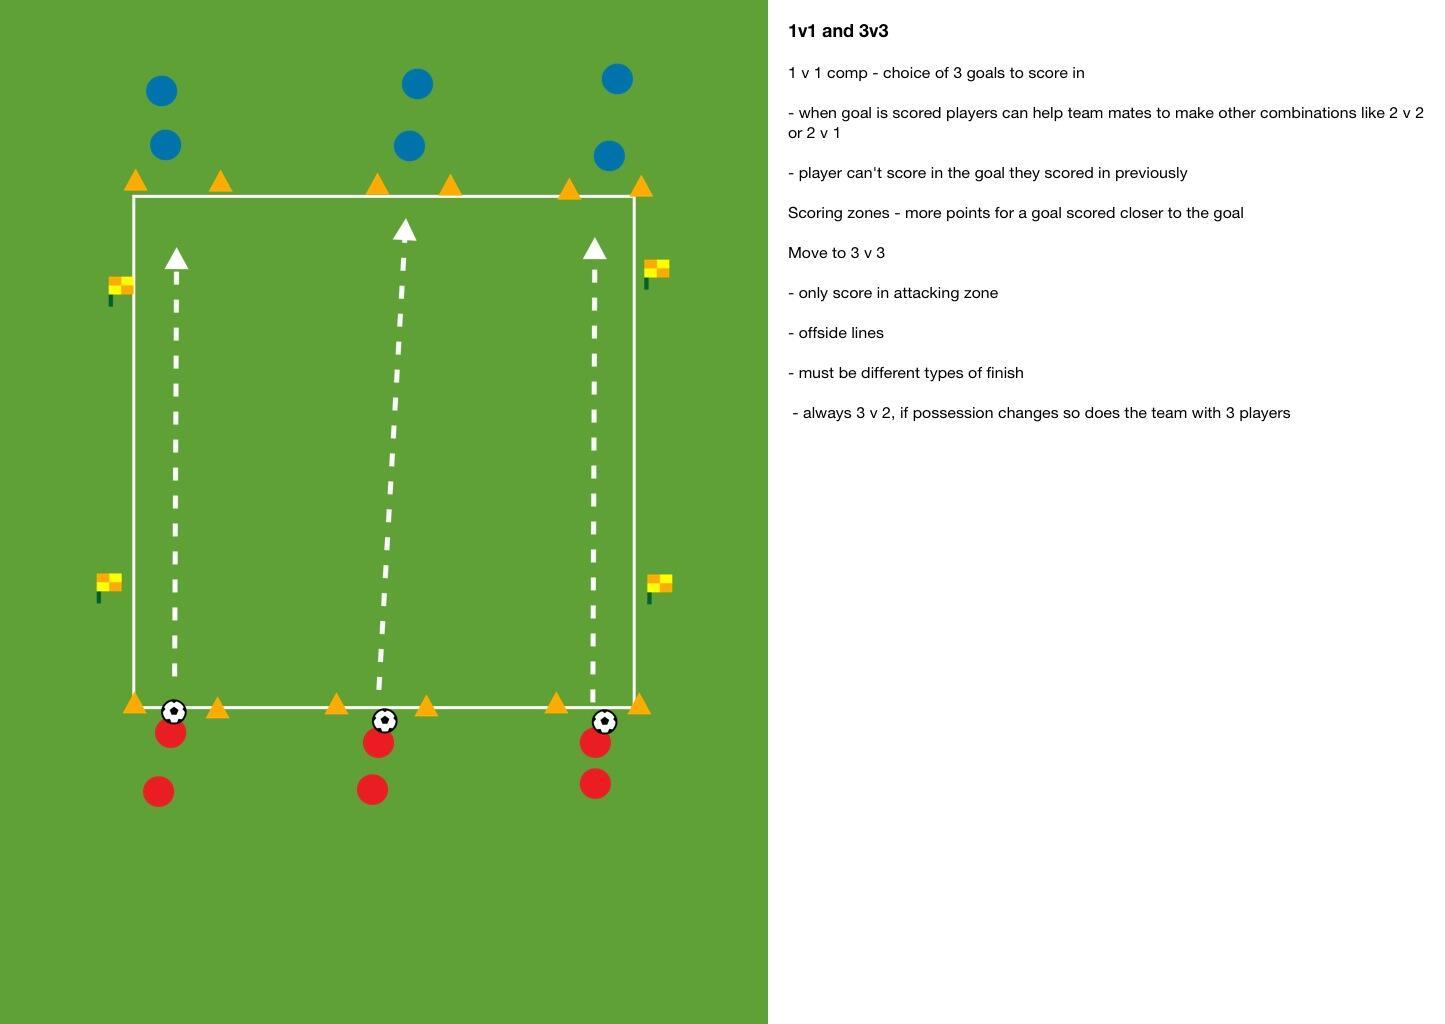 1 v 1 and 3 v 3 game with variations. Let them play! http://t.co/5NB3JLjLFd